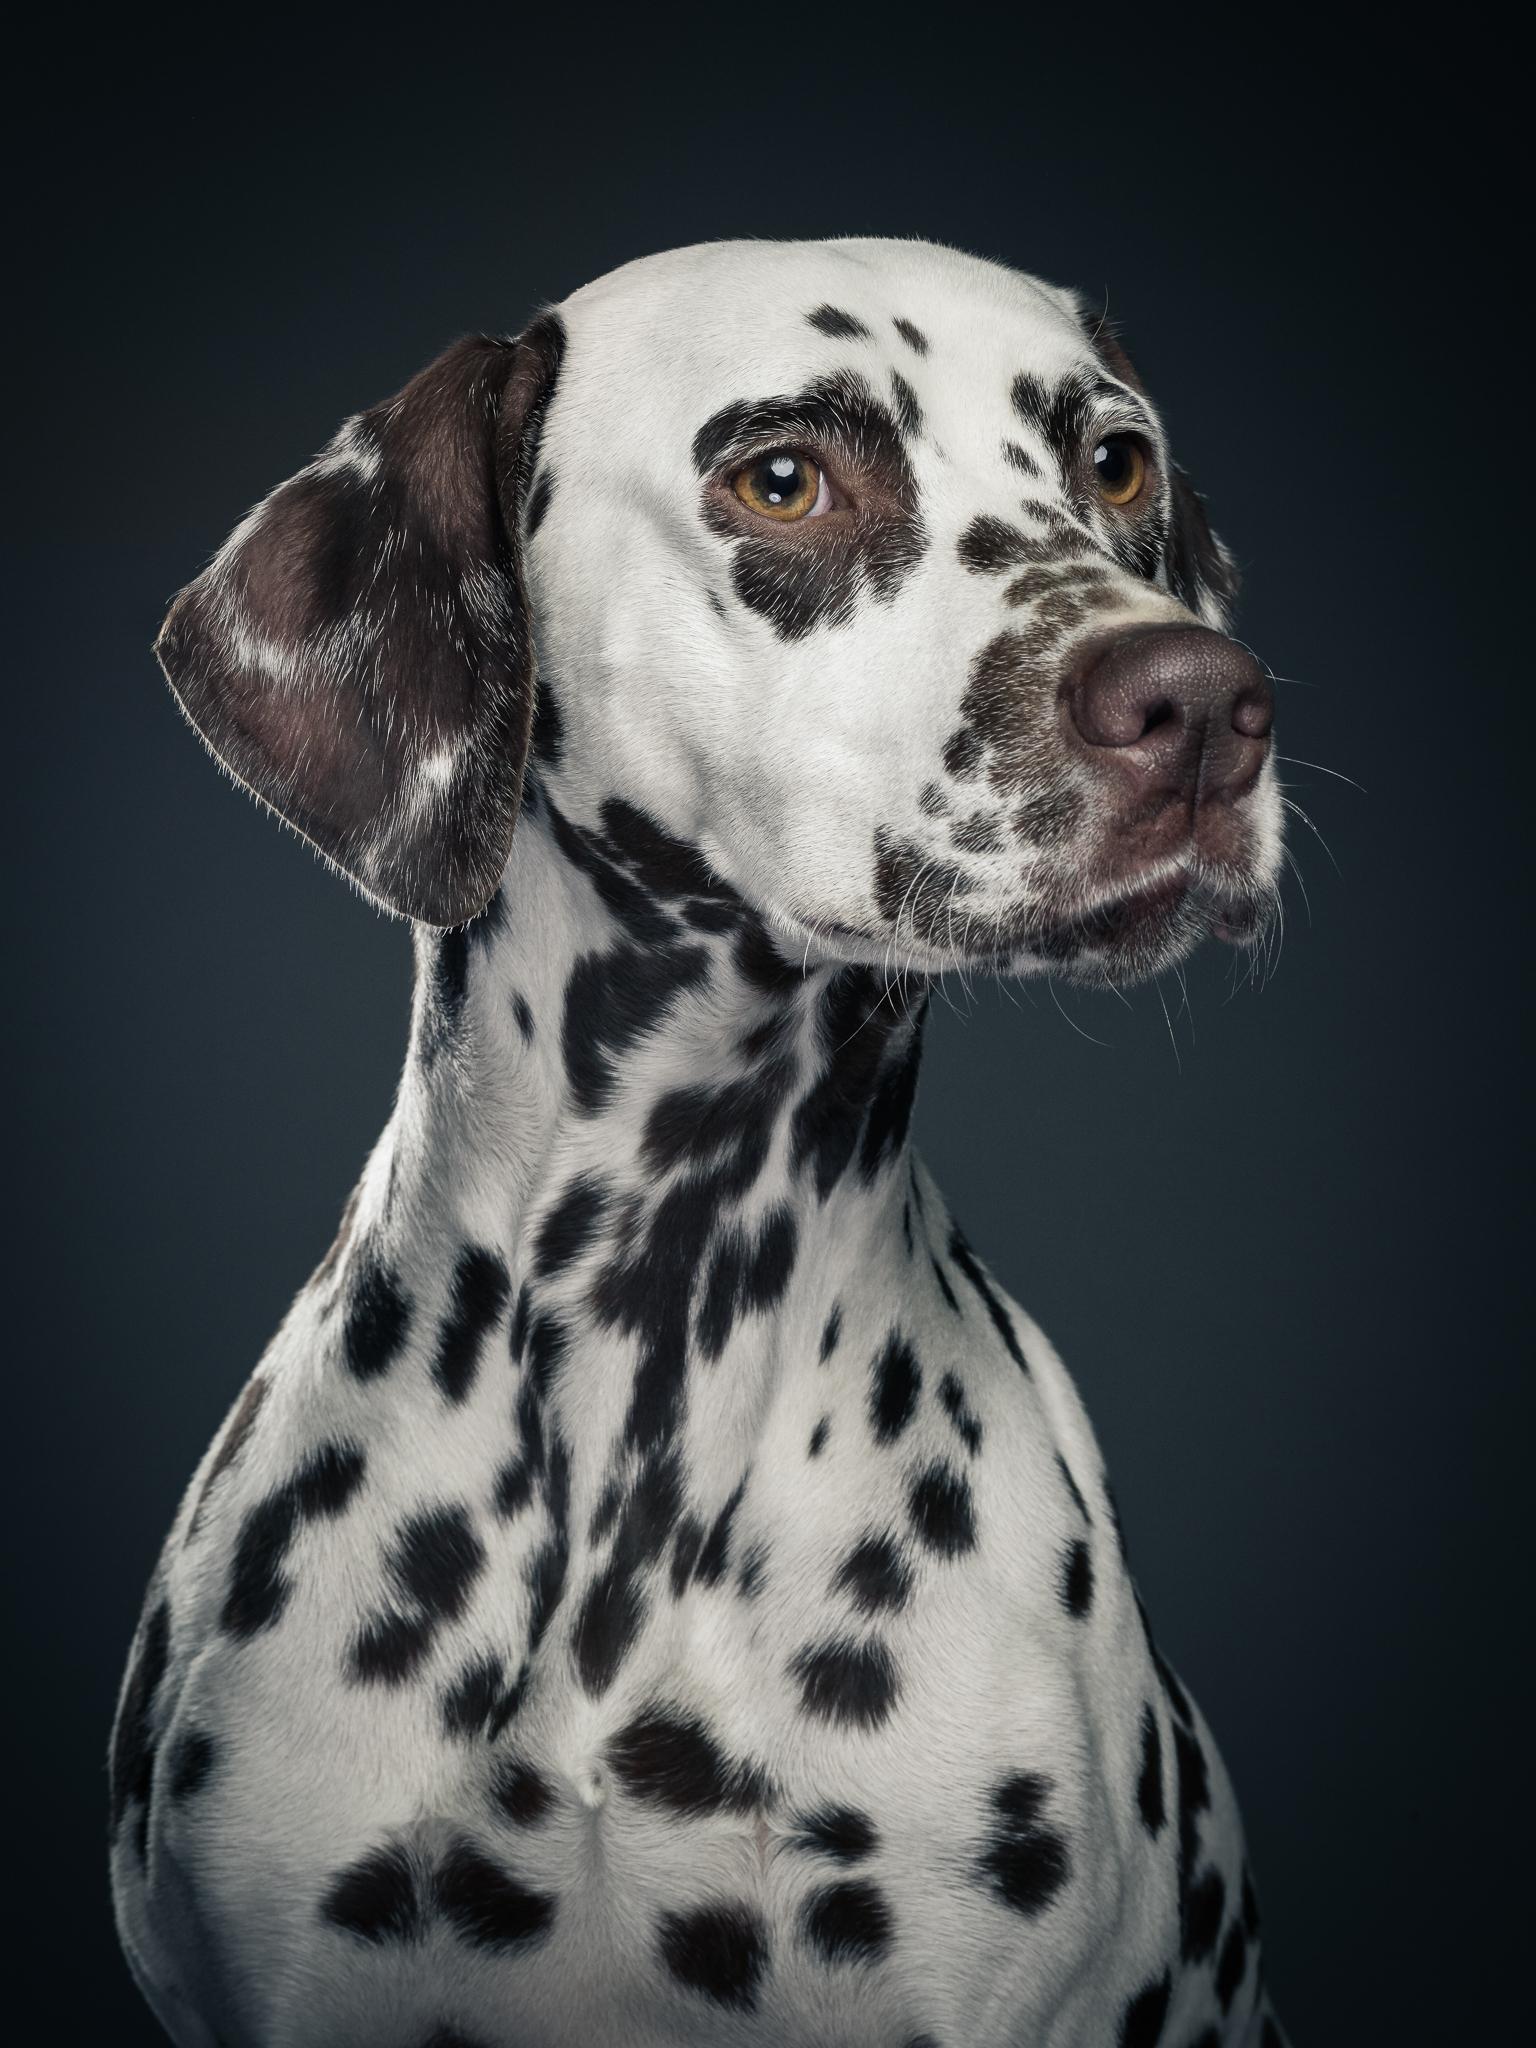 klaus-dyba-dog-photography-dalmatiner